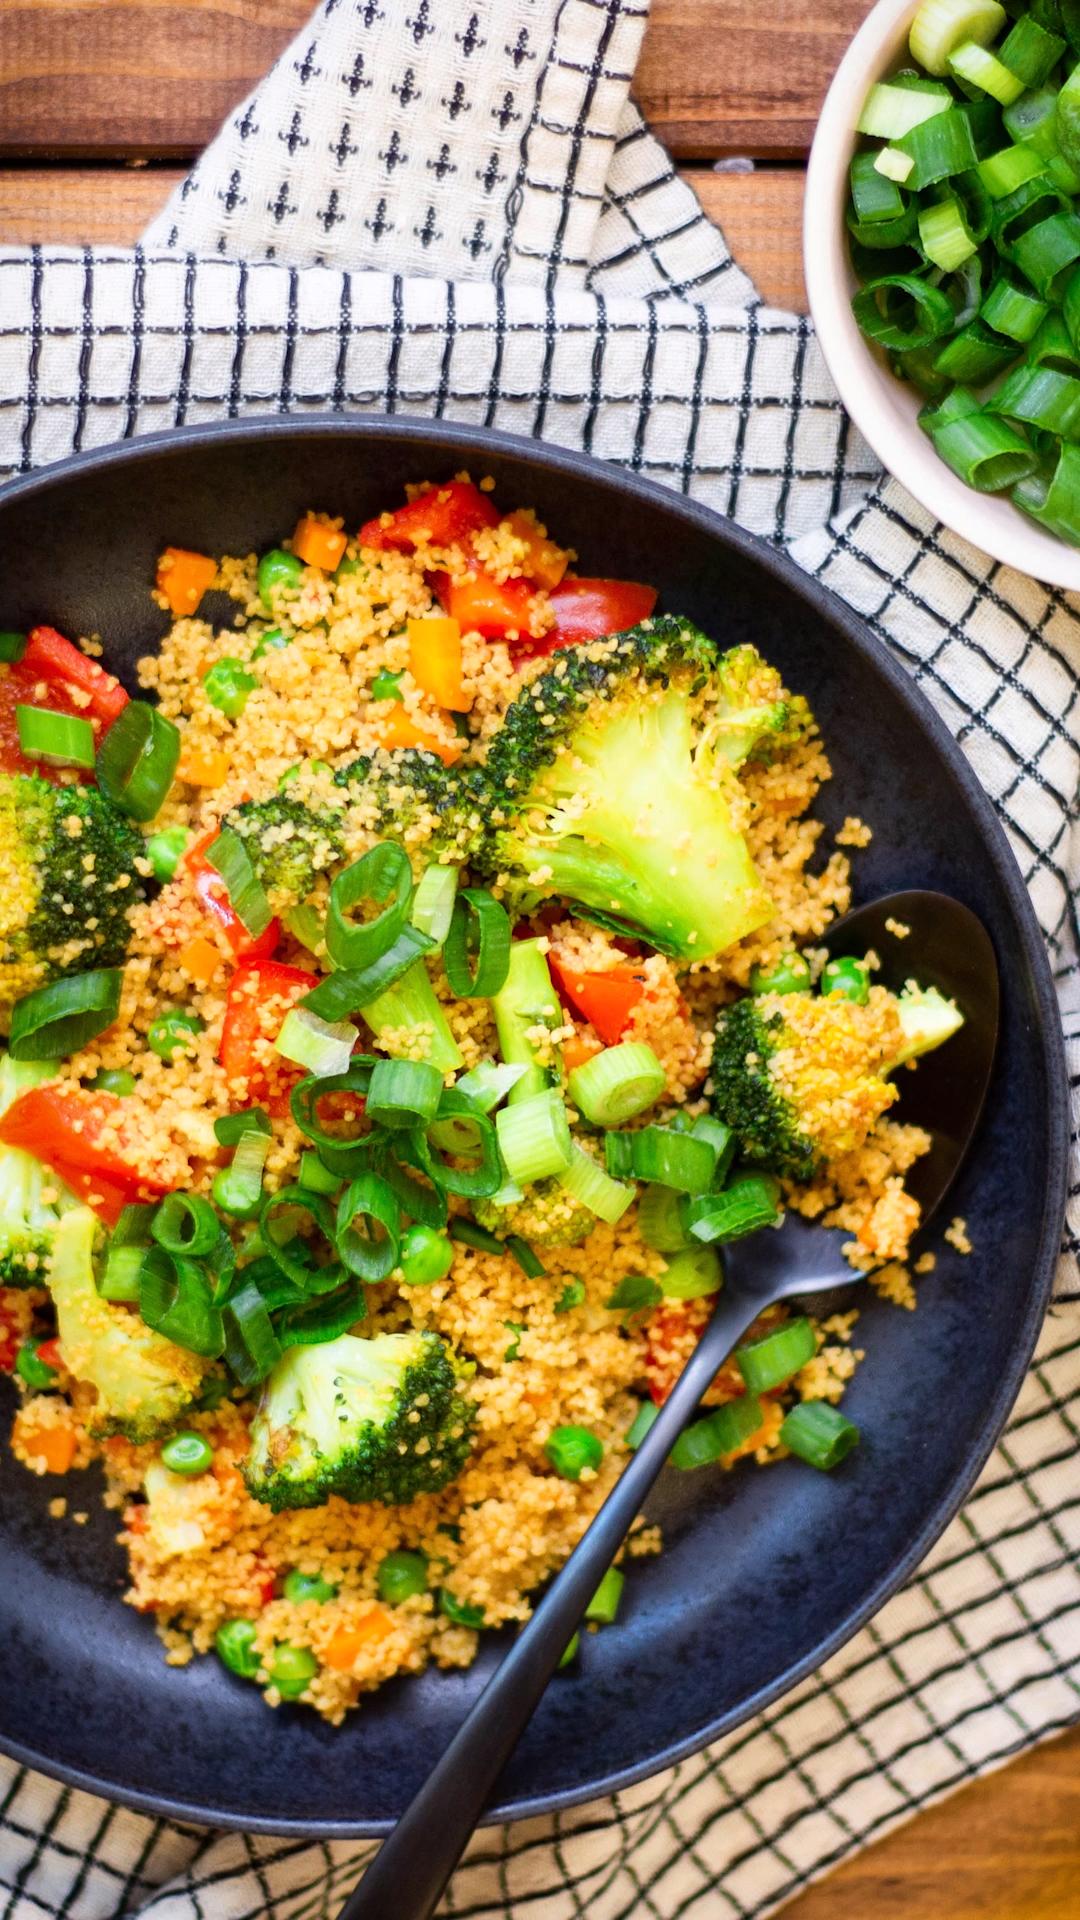 Couscous-Pfanne mit Gemüse